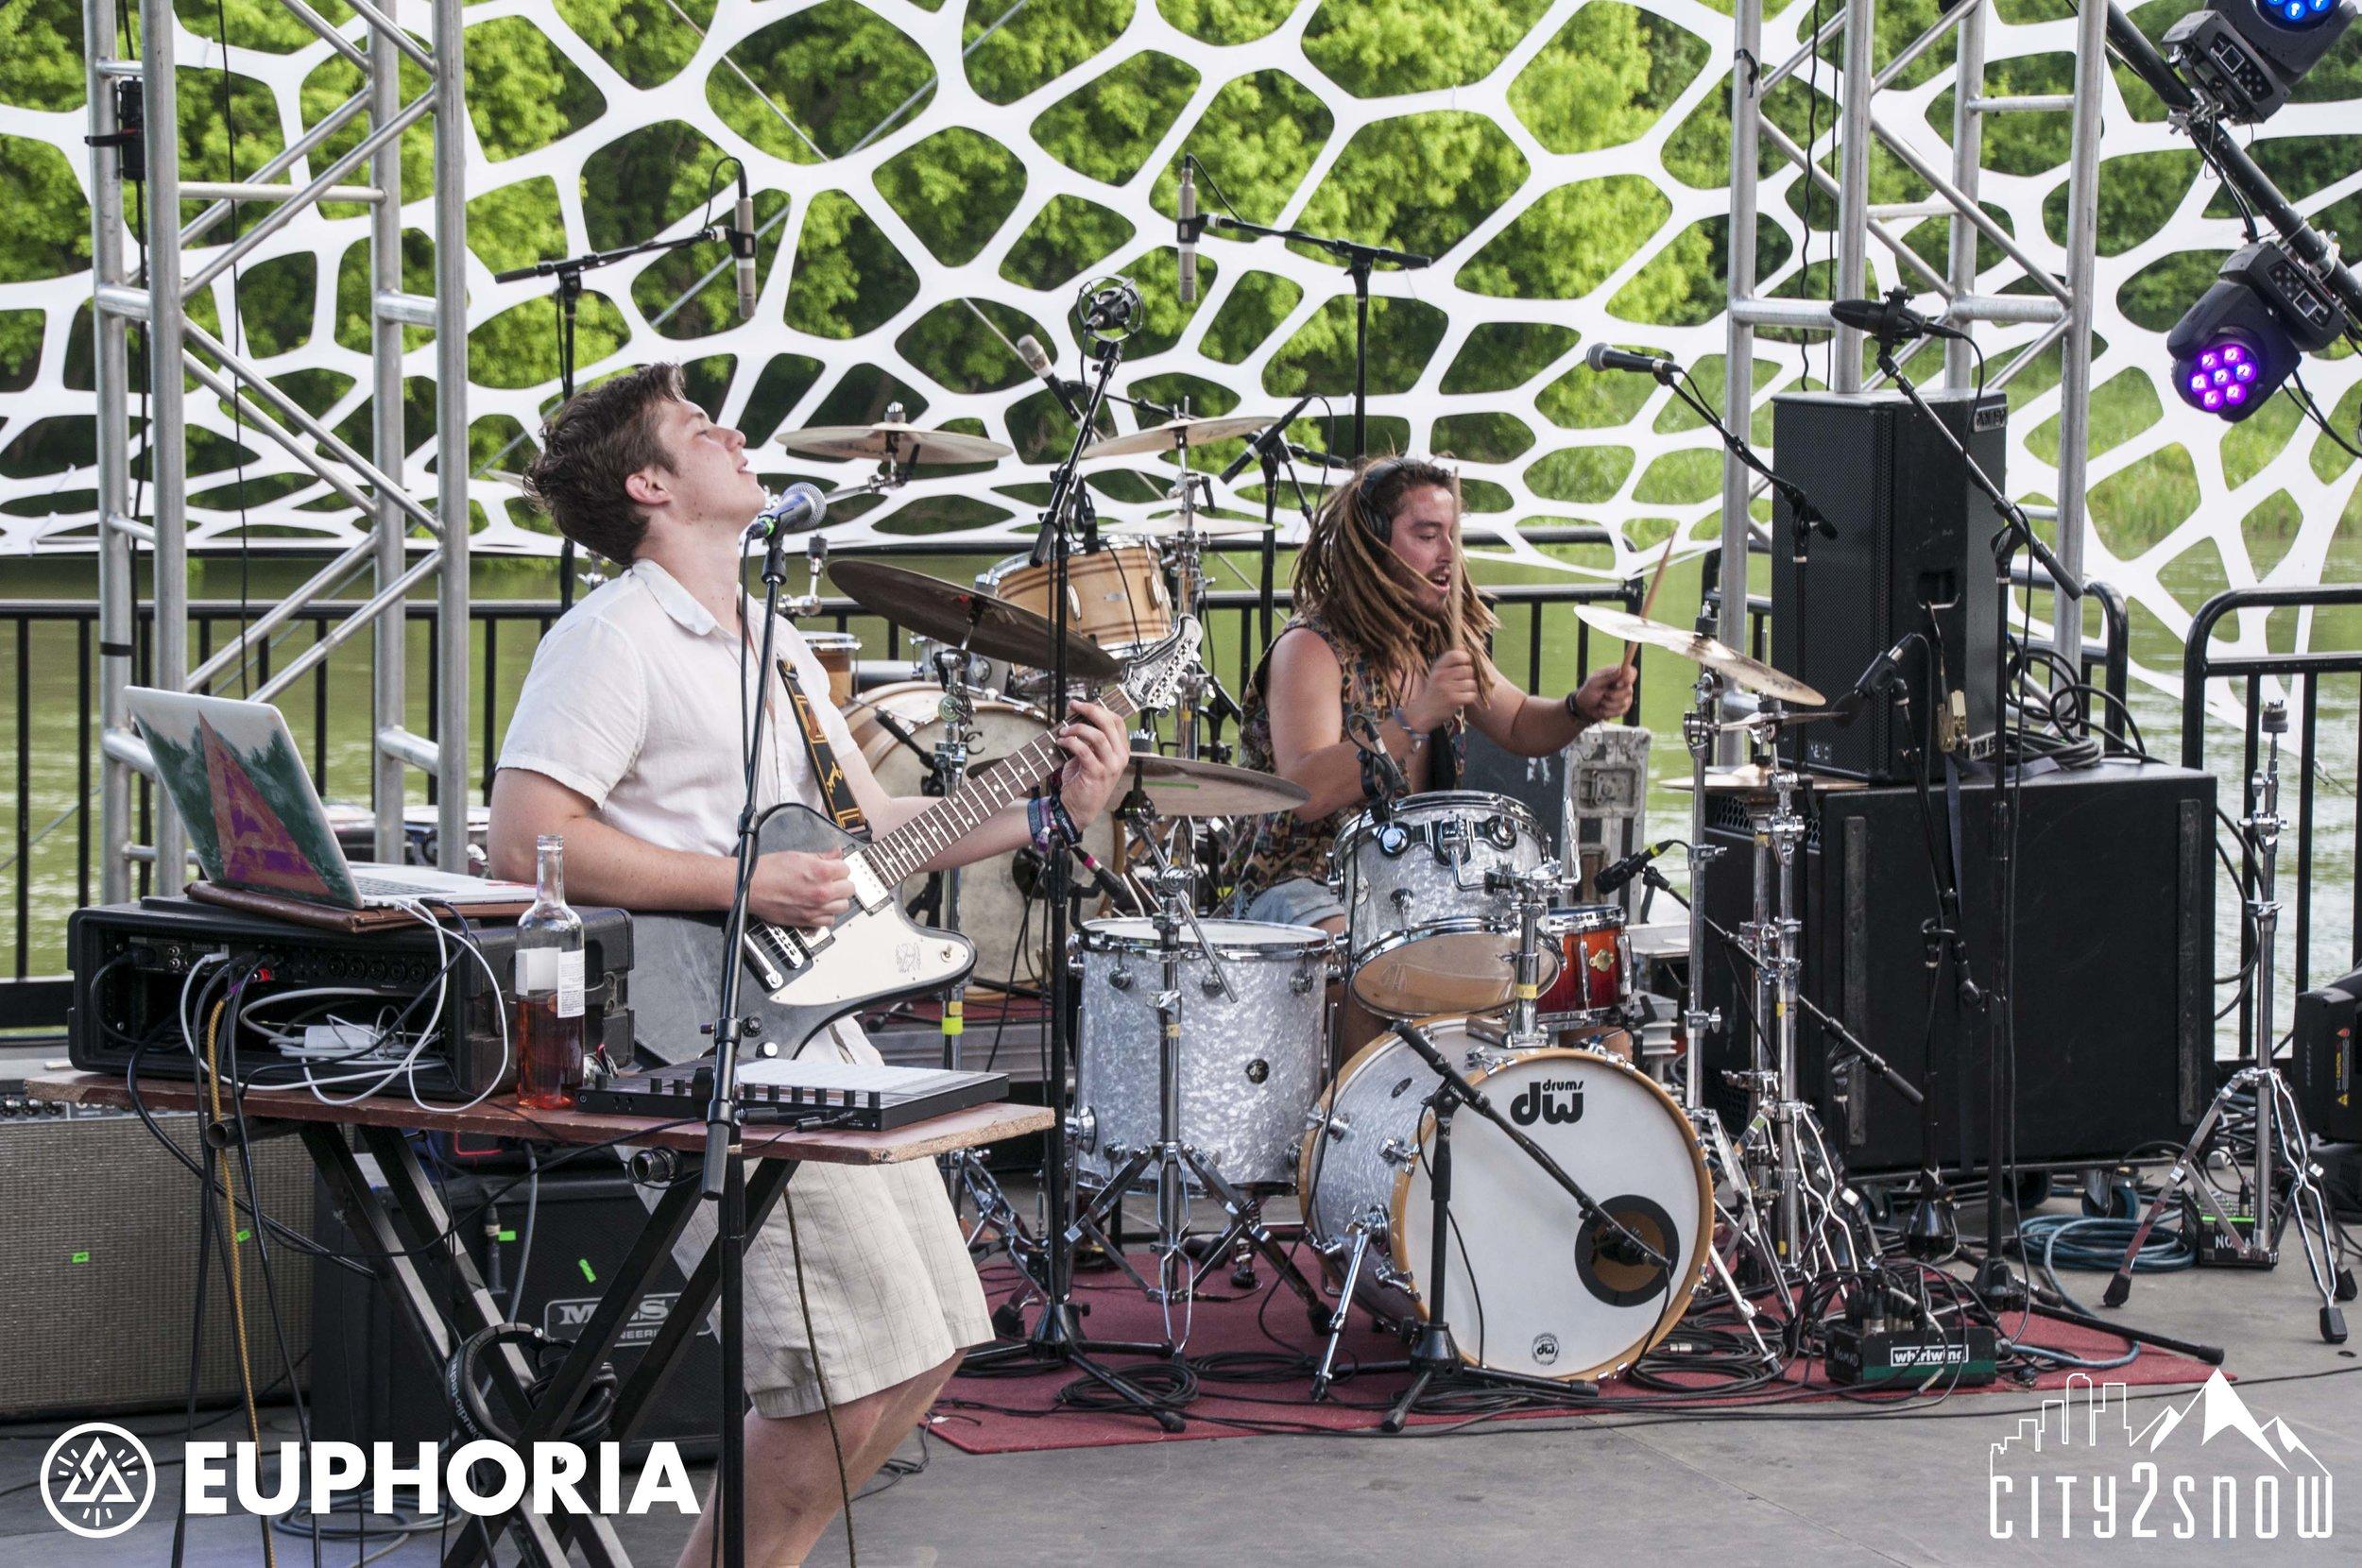 Euphoria-Music-Festival-2017-42.jpg